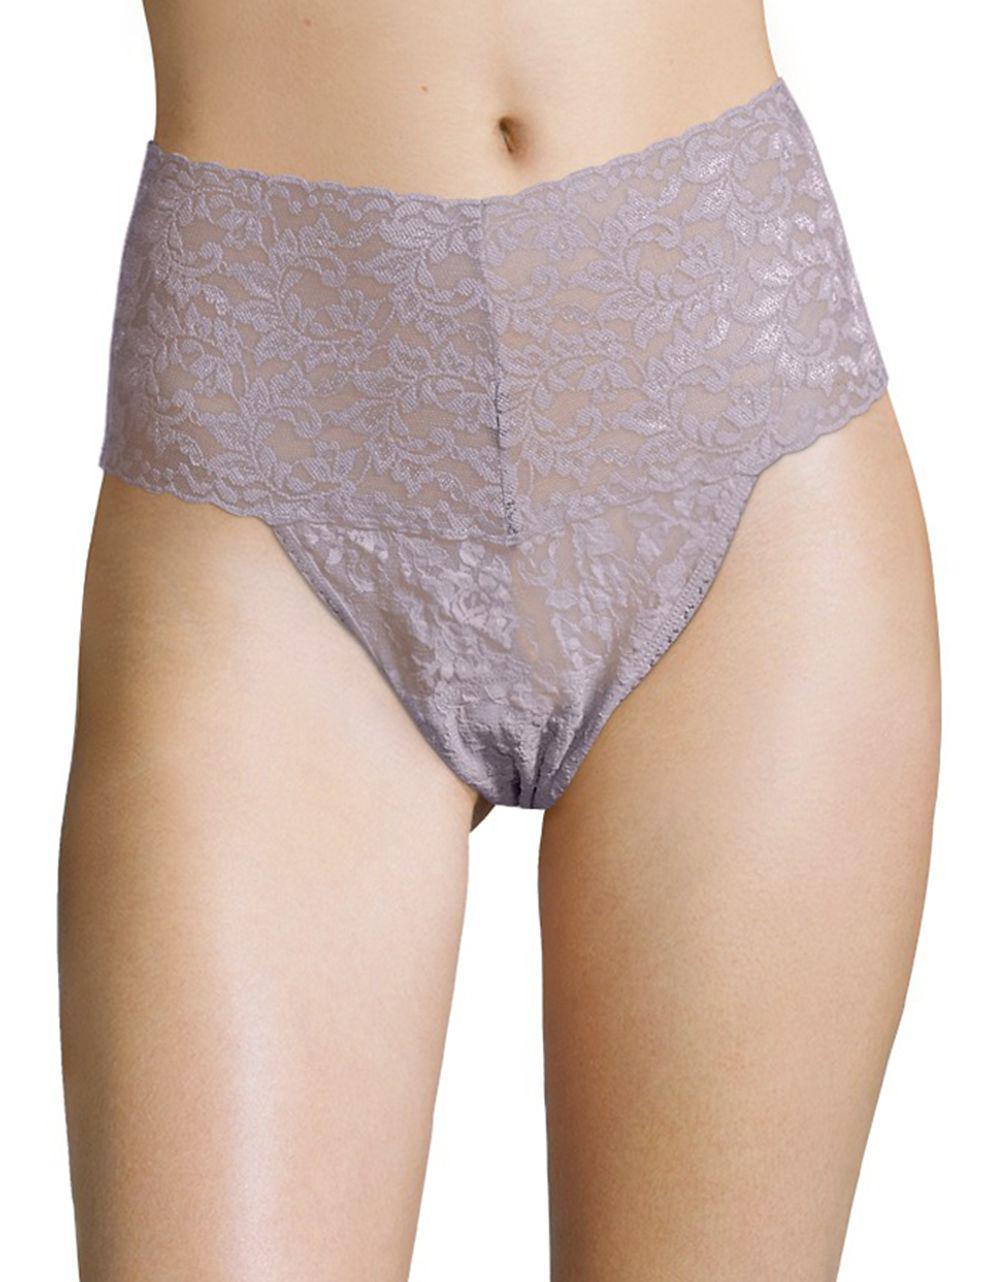 cb590b454d9 Lyst - Hanky Panky Plus Size Retro Lace V-kini Thong in Purple